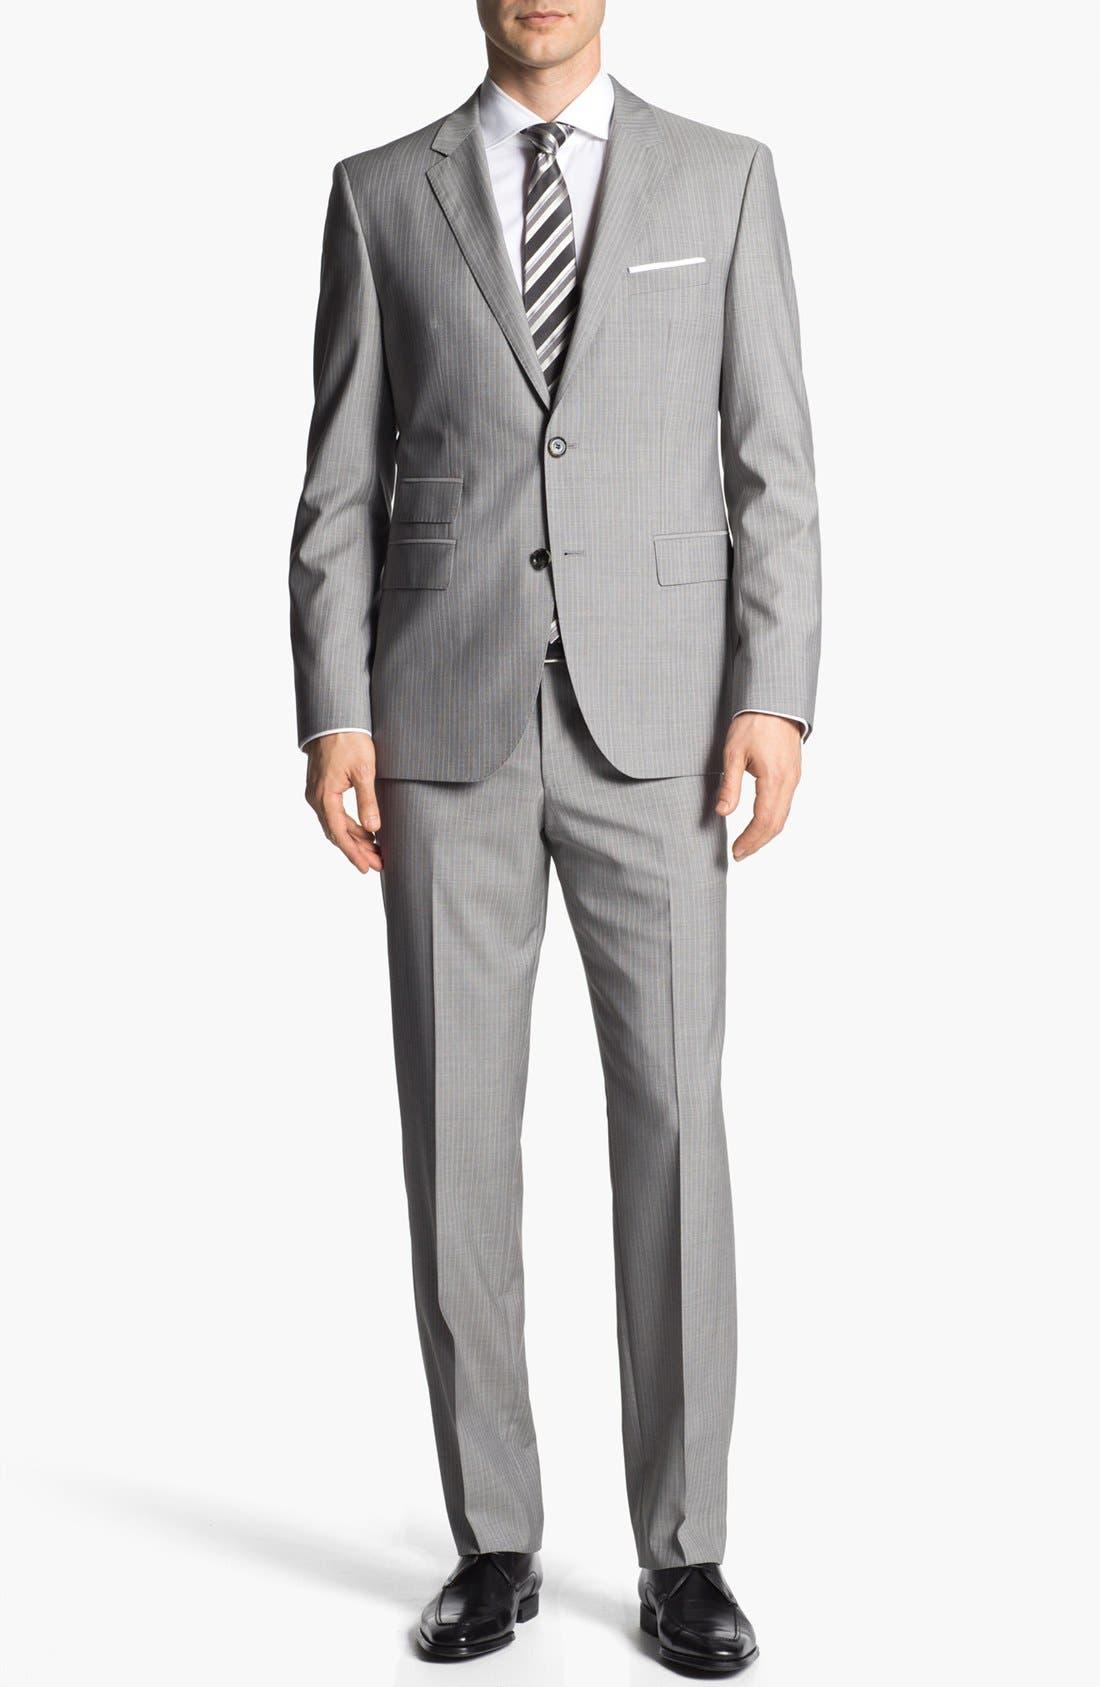 Alternate Image 1 Selected - BOSS HUGO BOSS 'The Sweet/Sharp' Trim Fit Stripe Suit